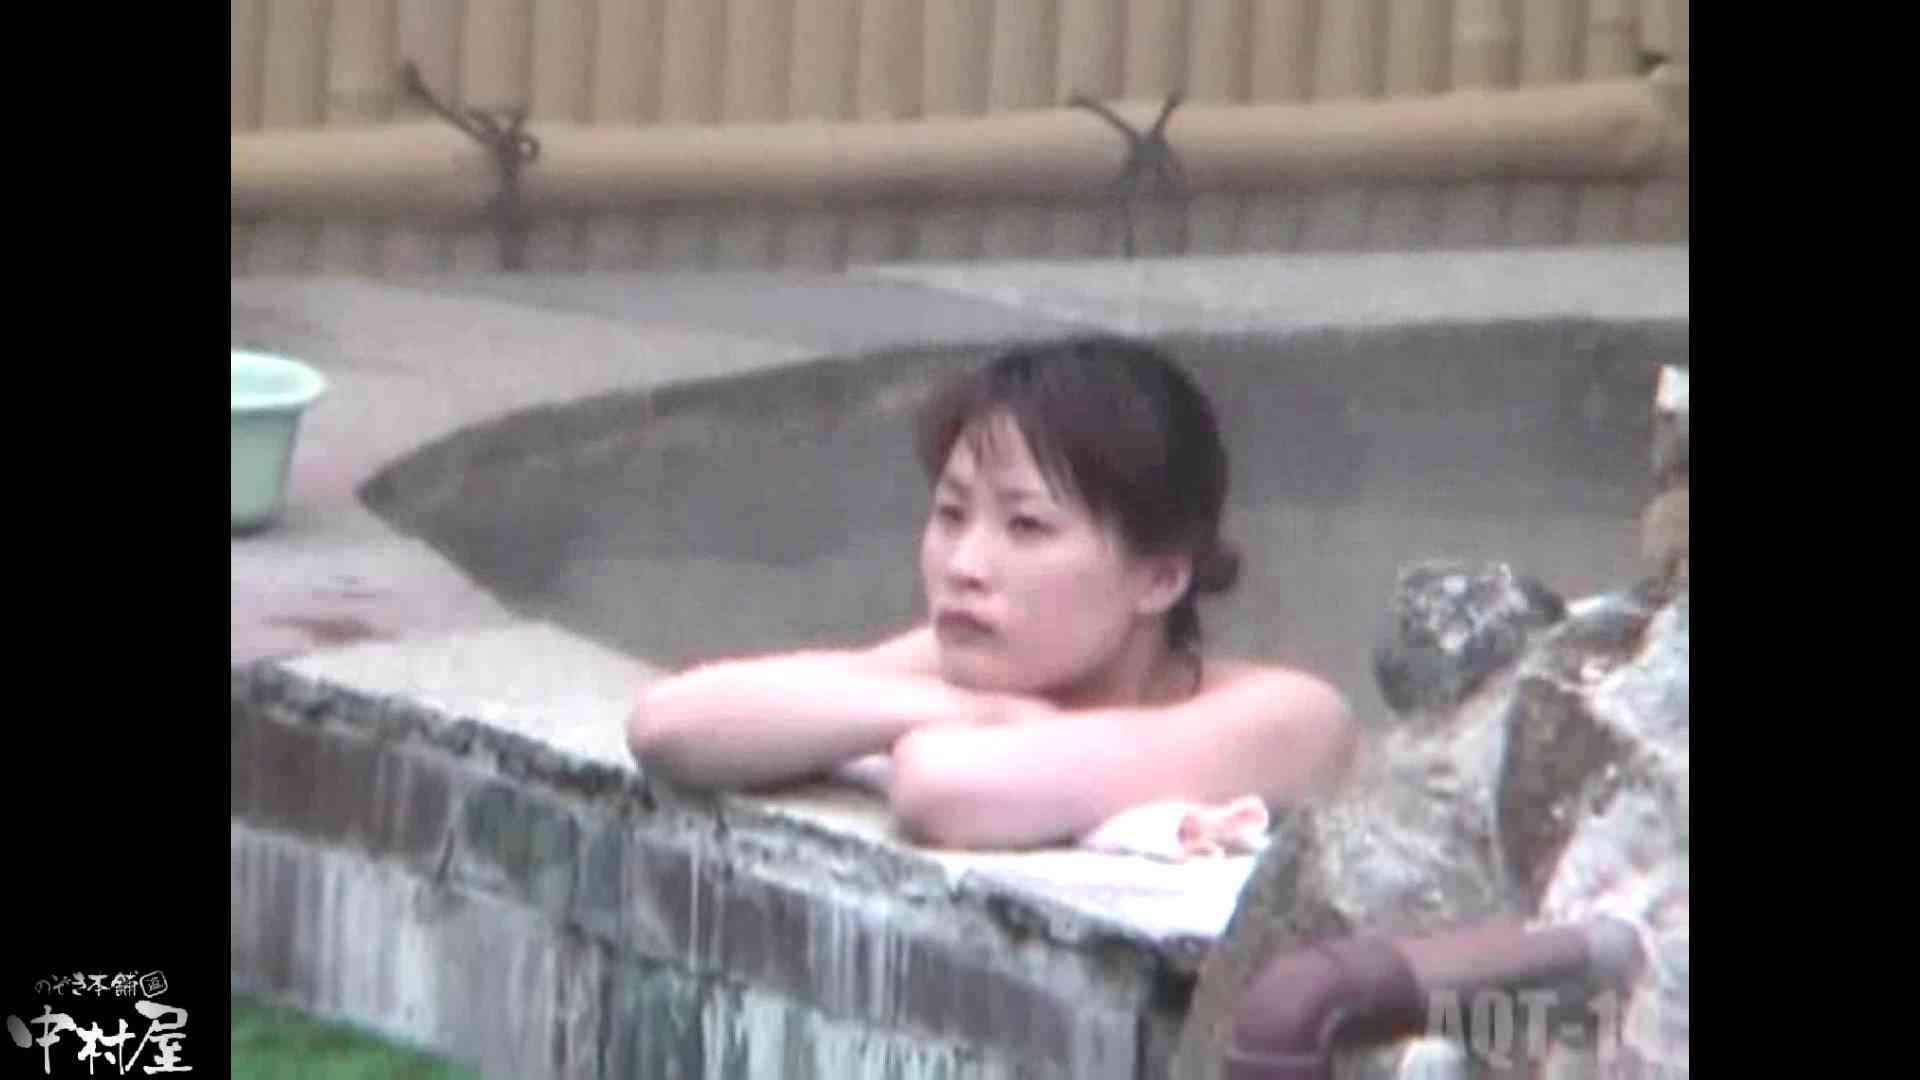 Aquaな露天風呂Vol.878潜入盗撮露天風呂十四判湯 其の三 潜入  110画像 40